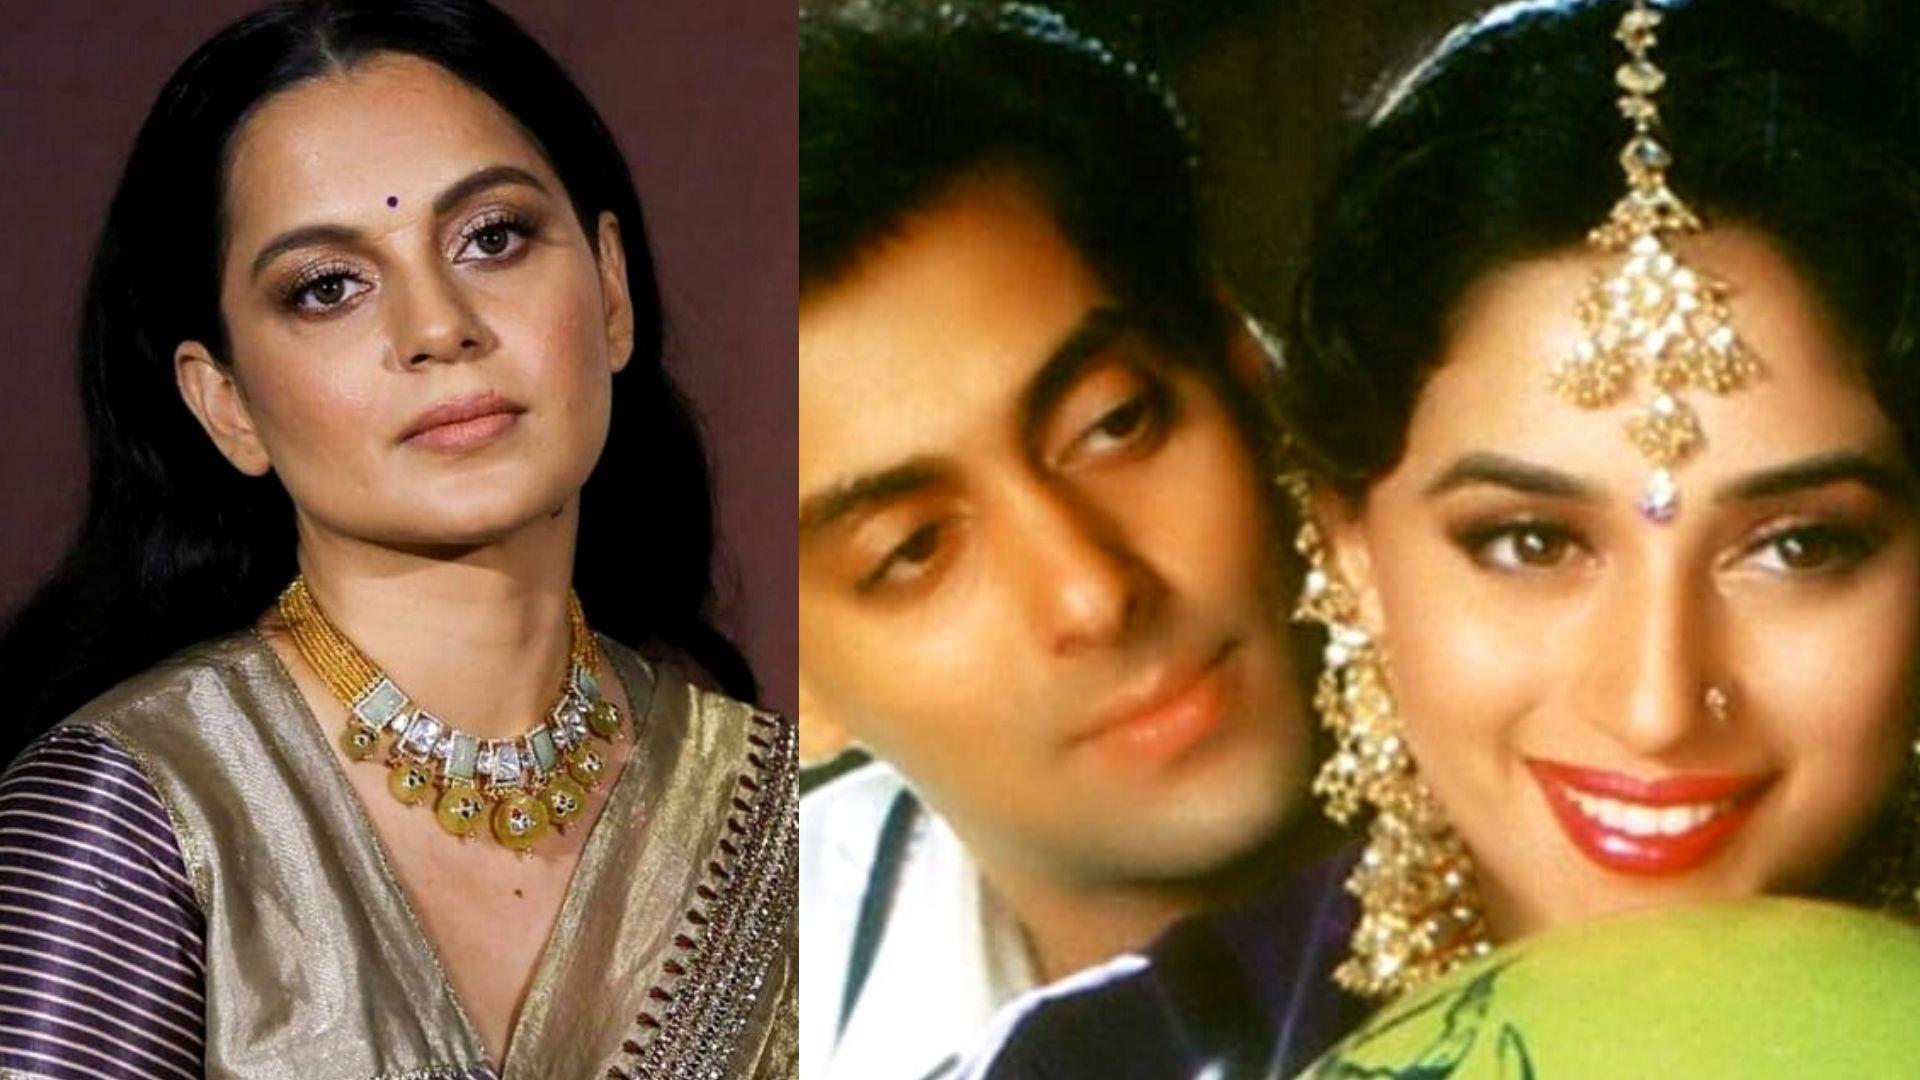 Kangana Ranaut Is All Hearts On Madhuri Dixit And Salman Khan's Video From Hum Aapke Hai Kaun